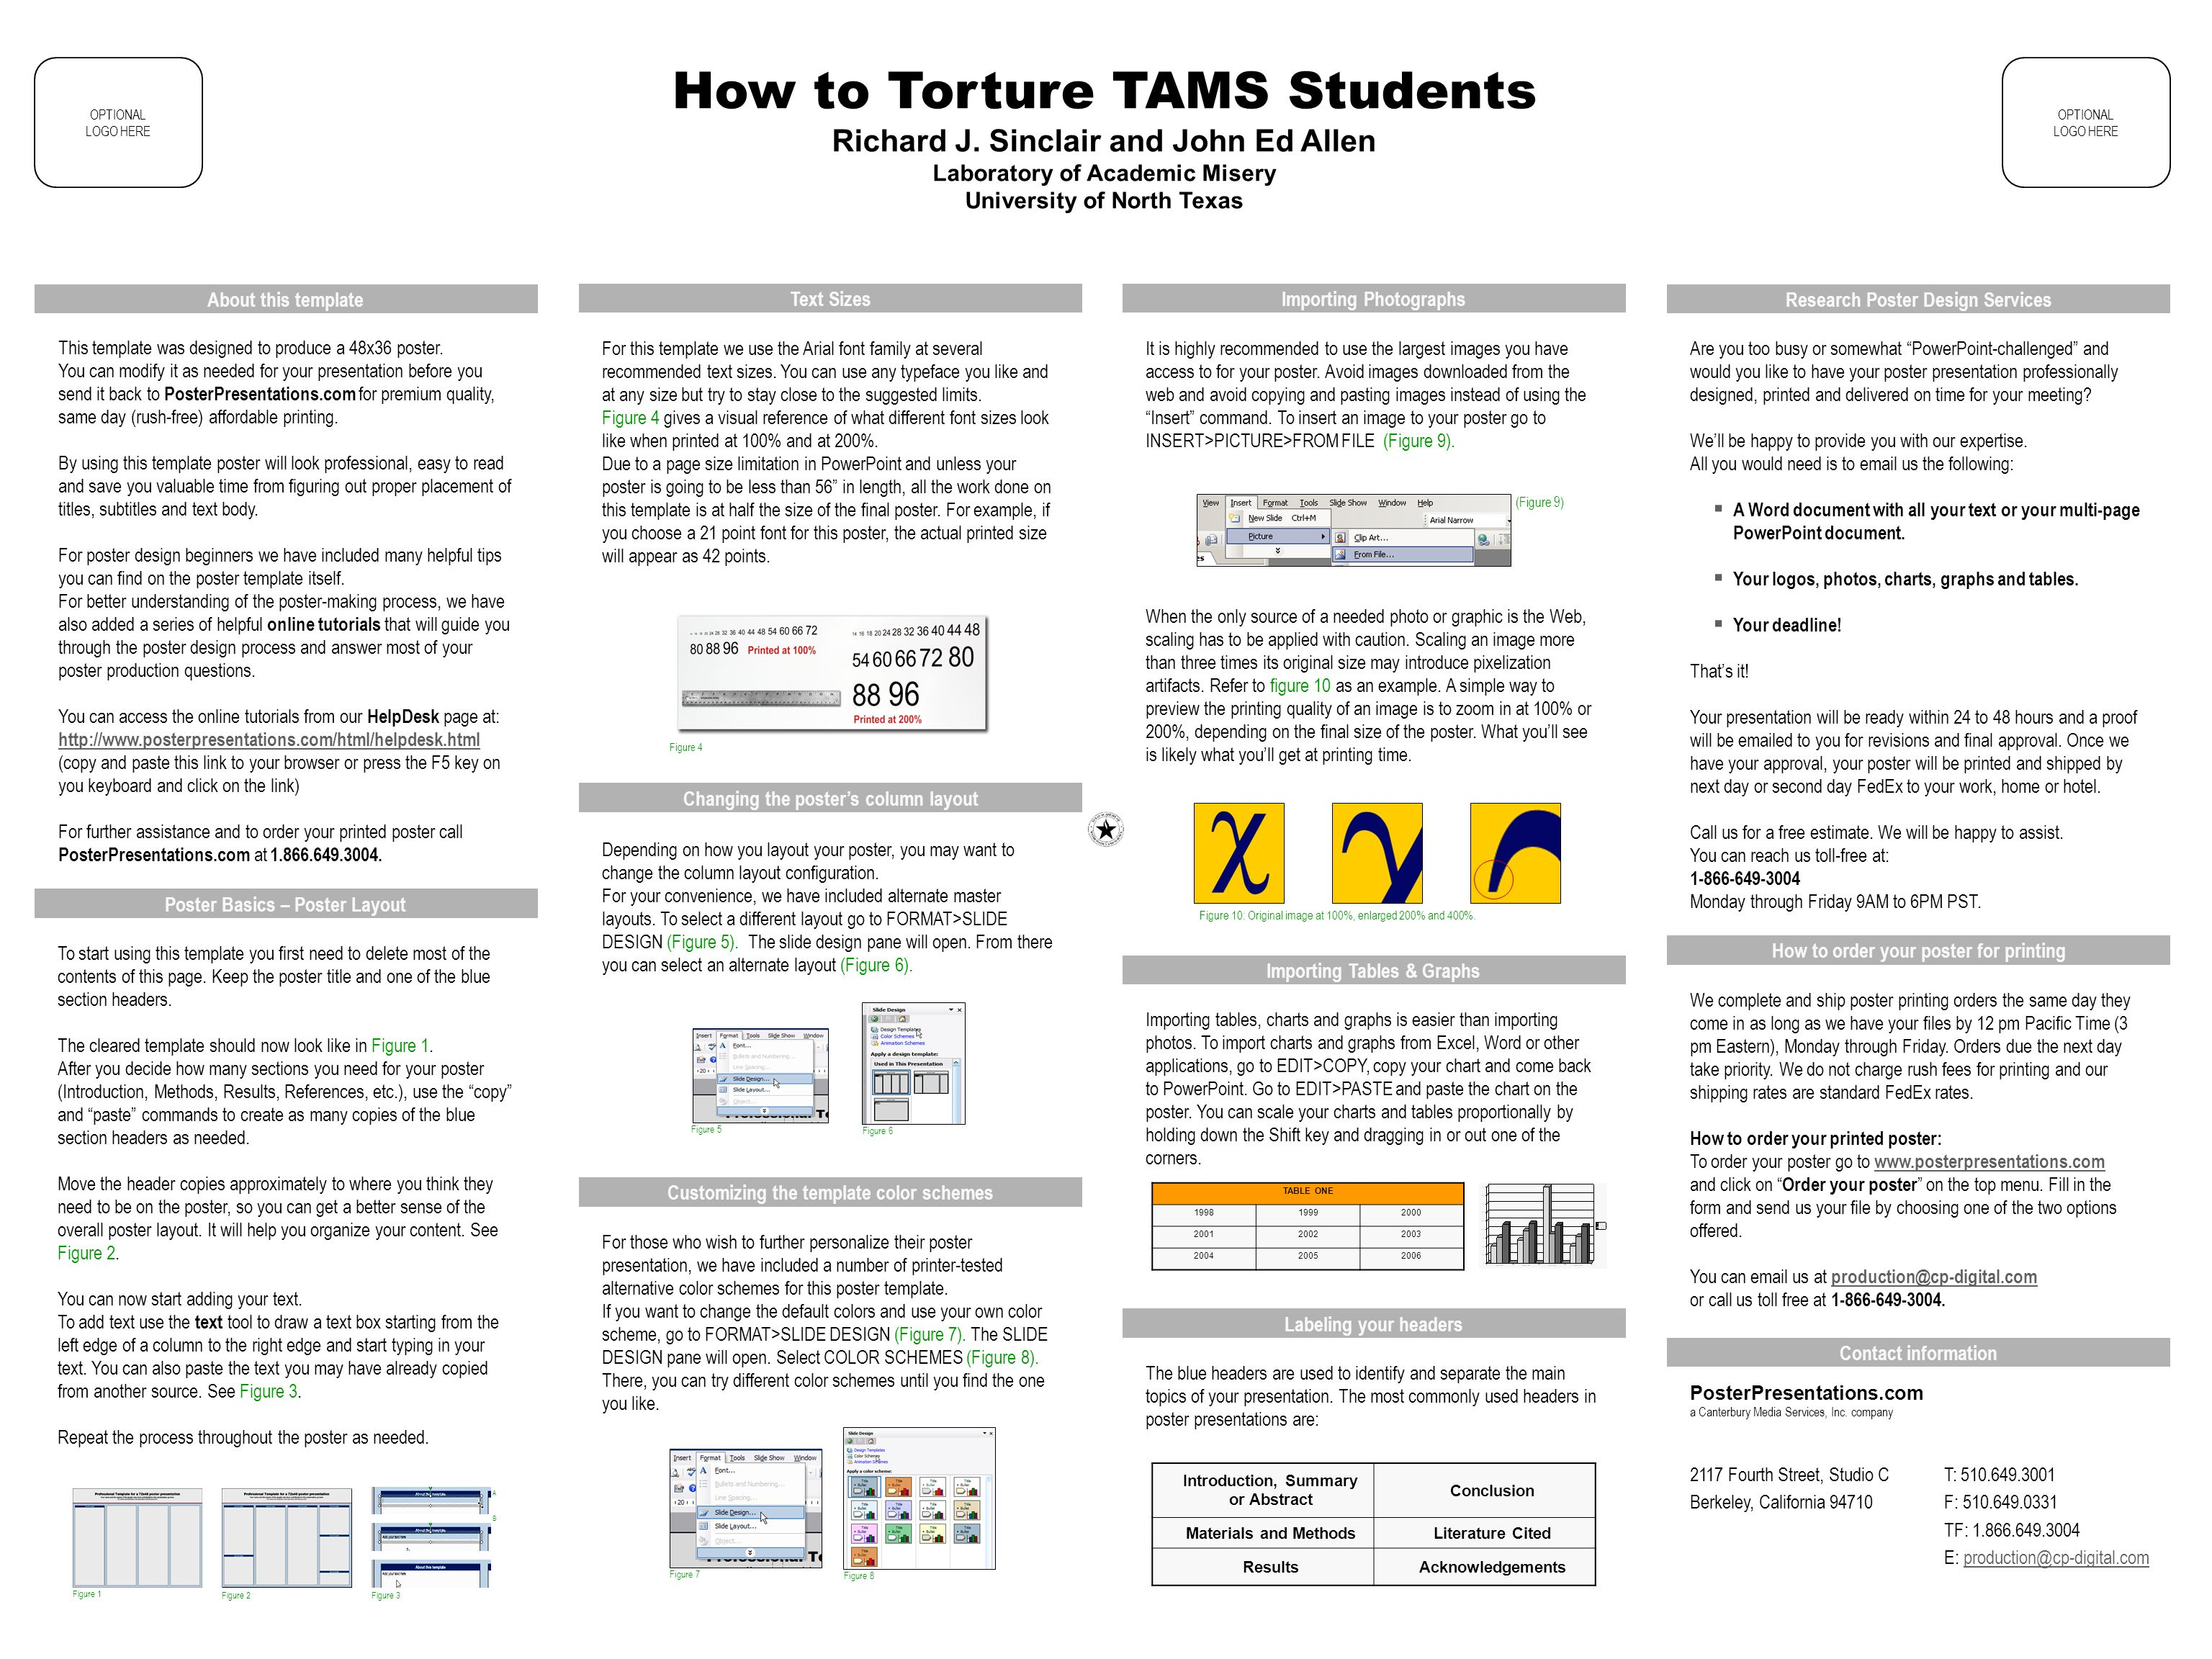 Poster presentation text size